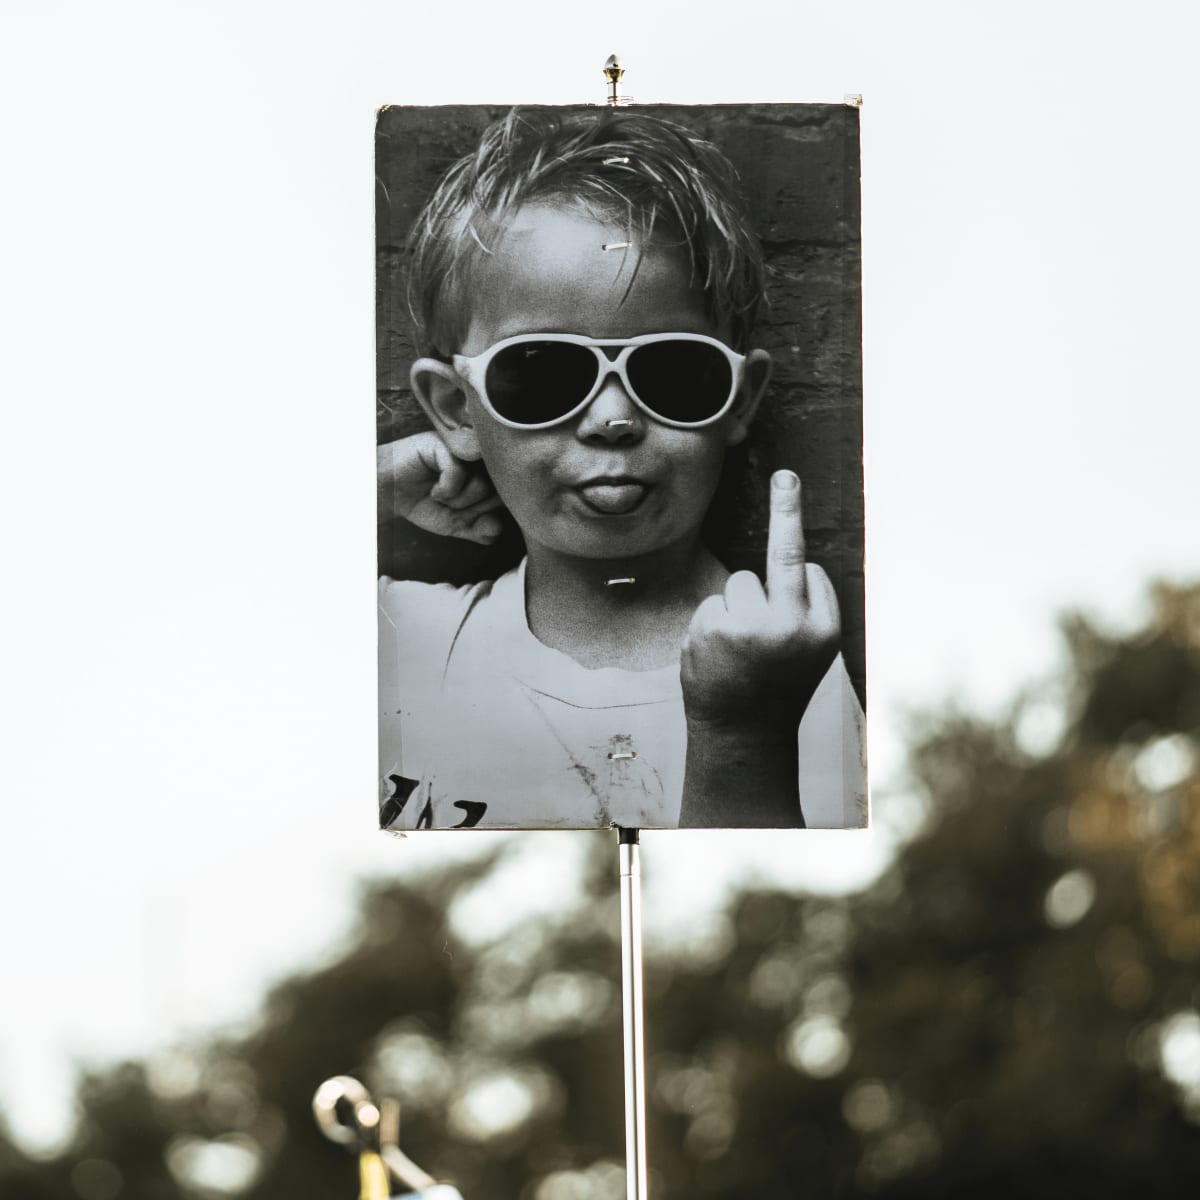 ACL Austin City Limits Music Festival 2016 flags kids middle finger